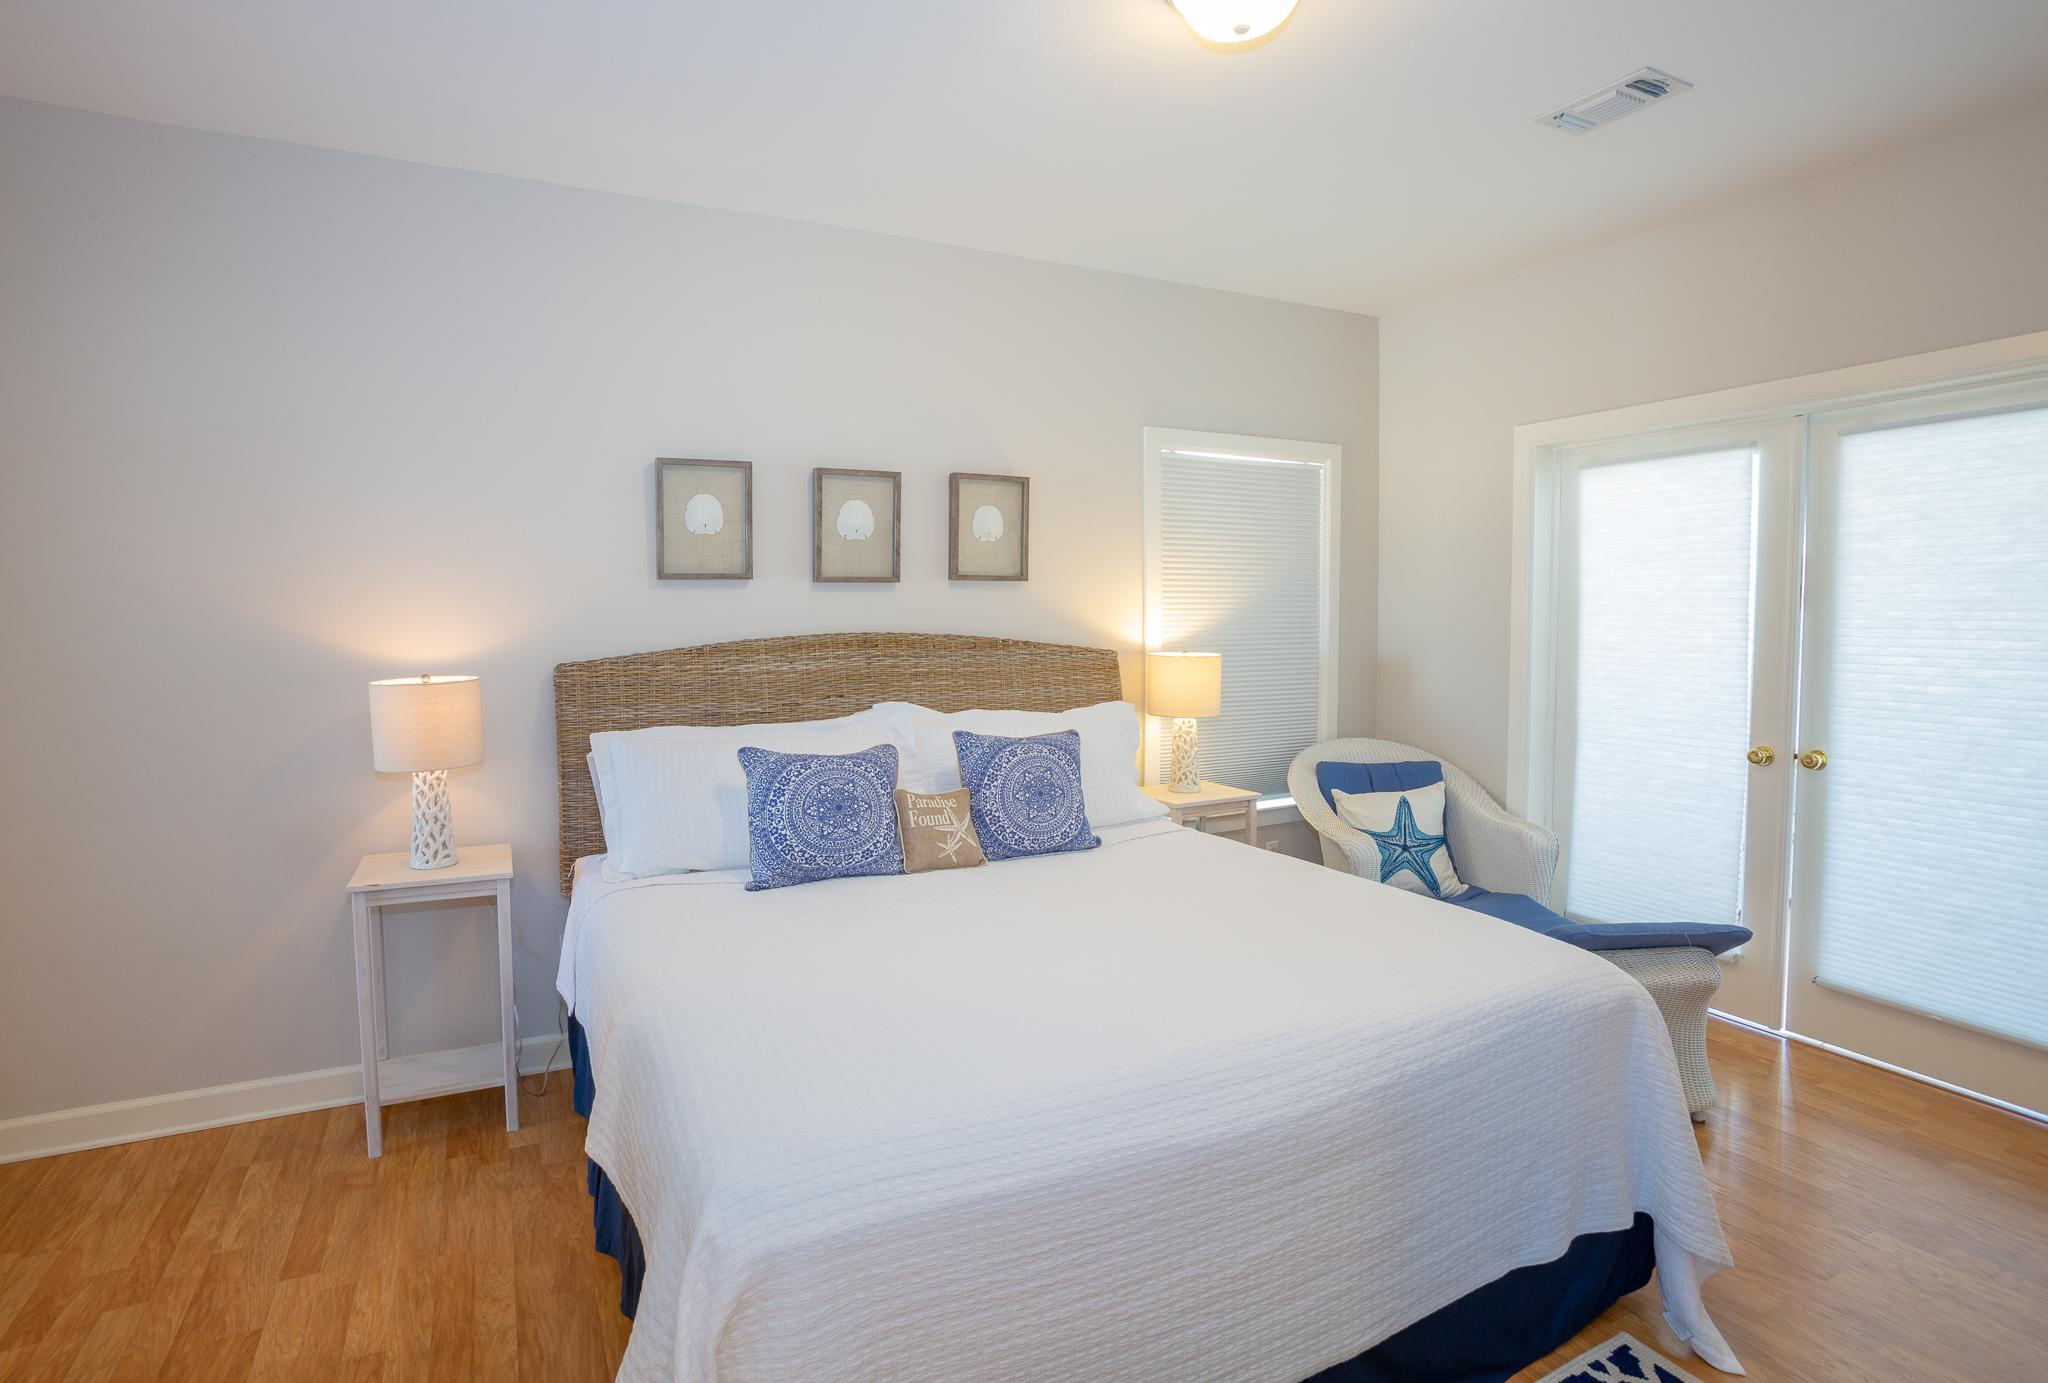 Ariola 600 House/Cottage rental in Pensacola Beach House Rentals in Pensacola Beach Florida - #15